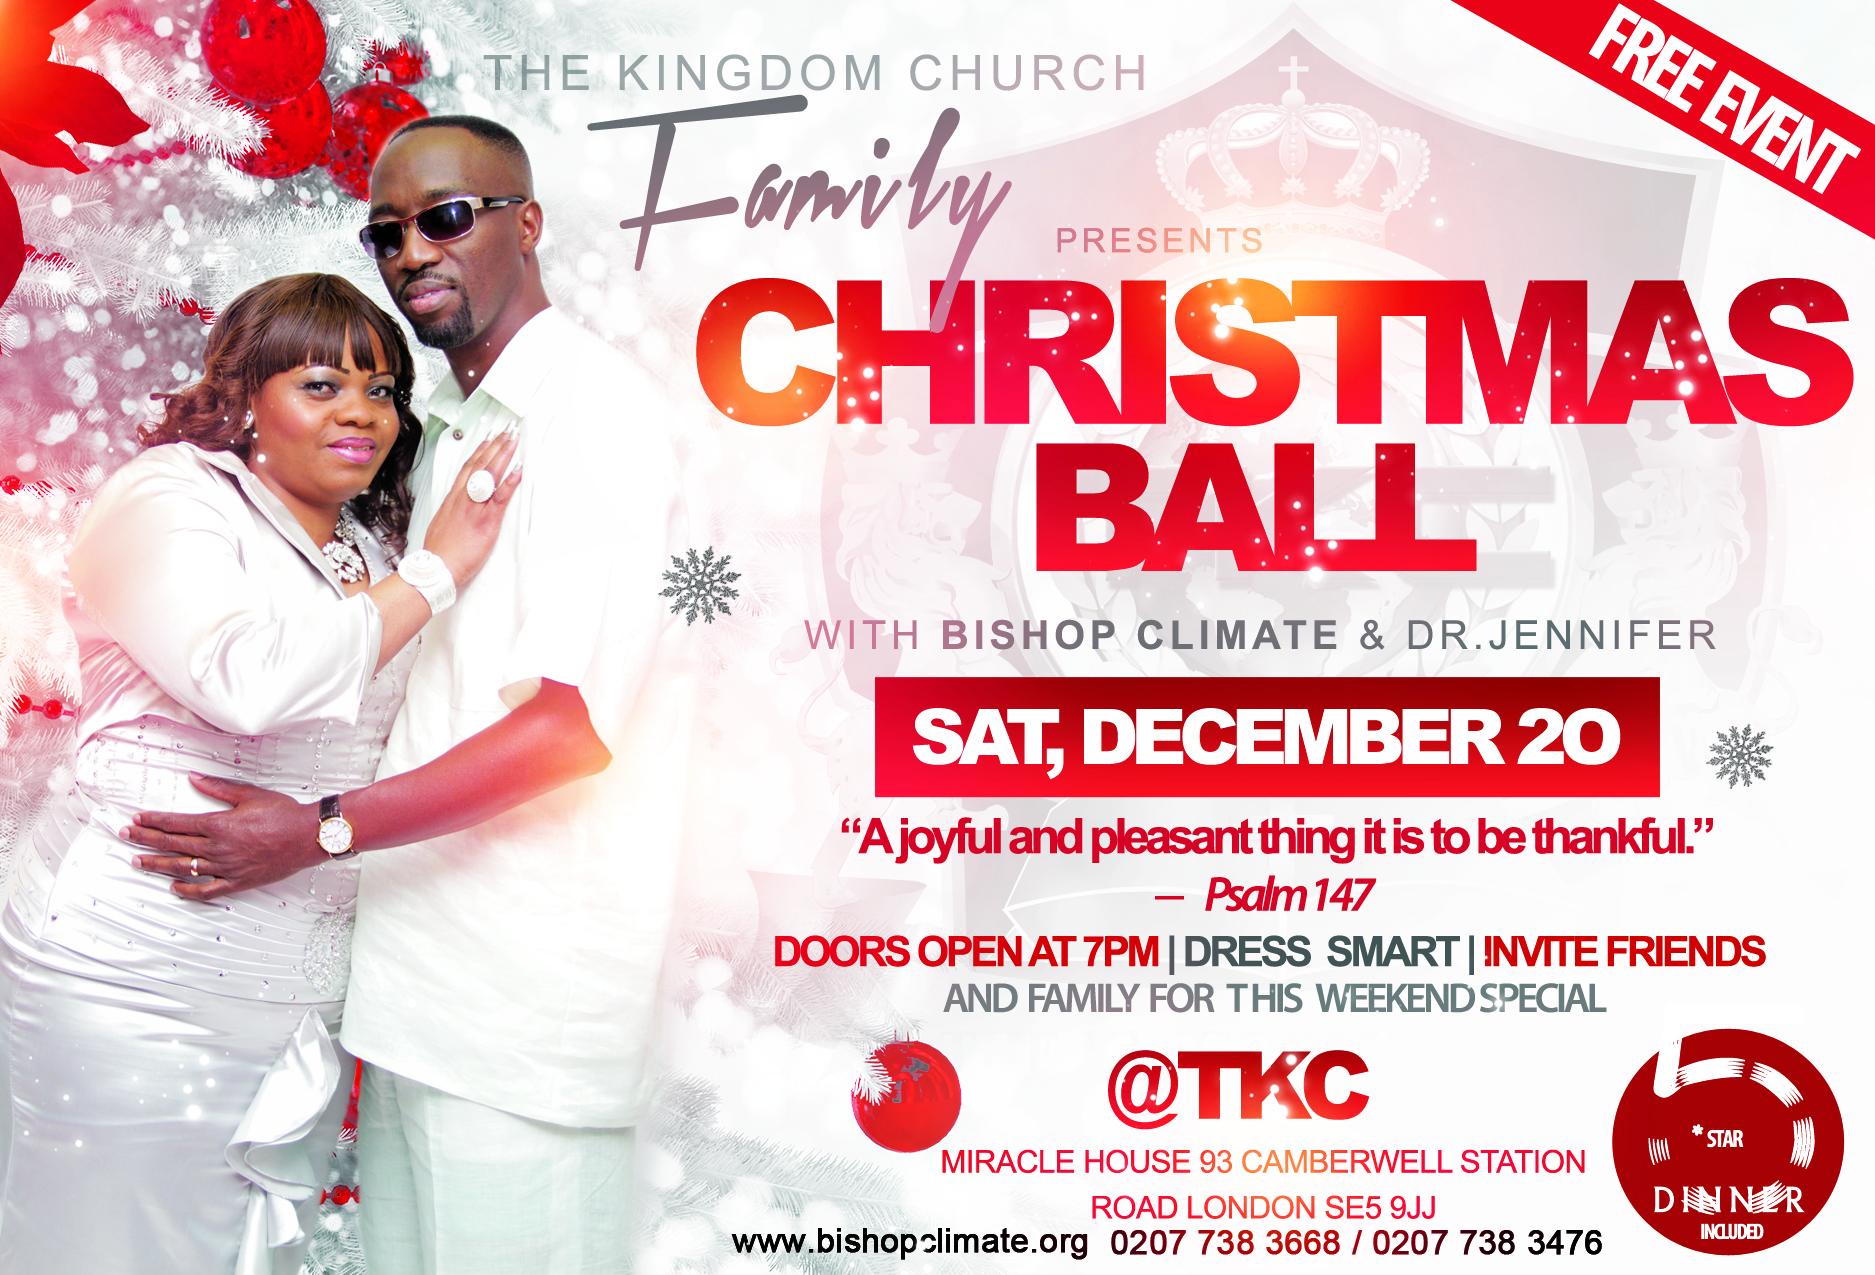 TKC Christmas Ball 2014